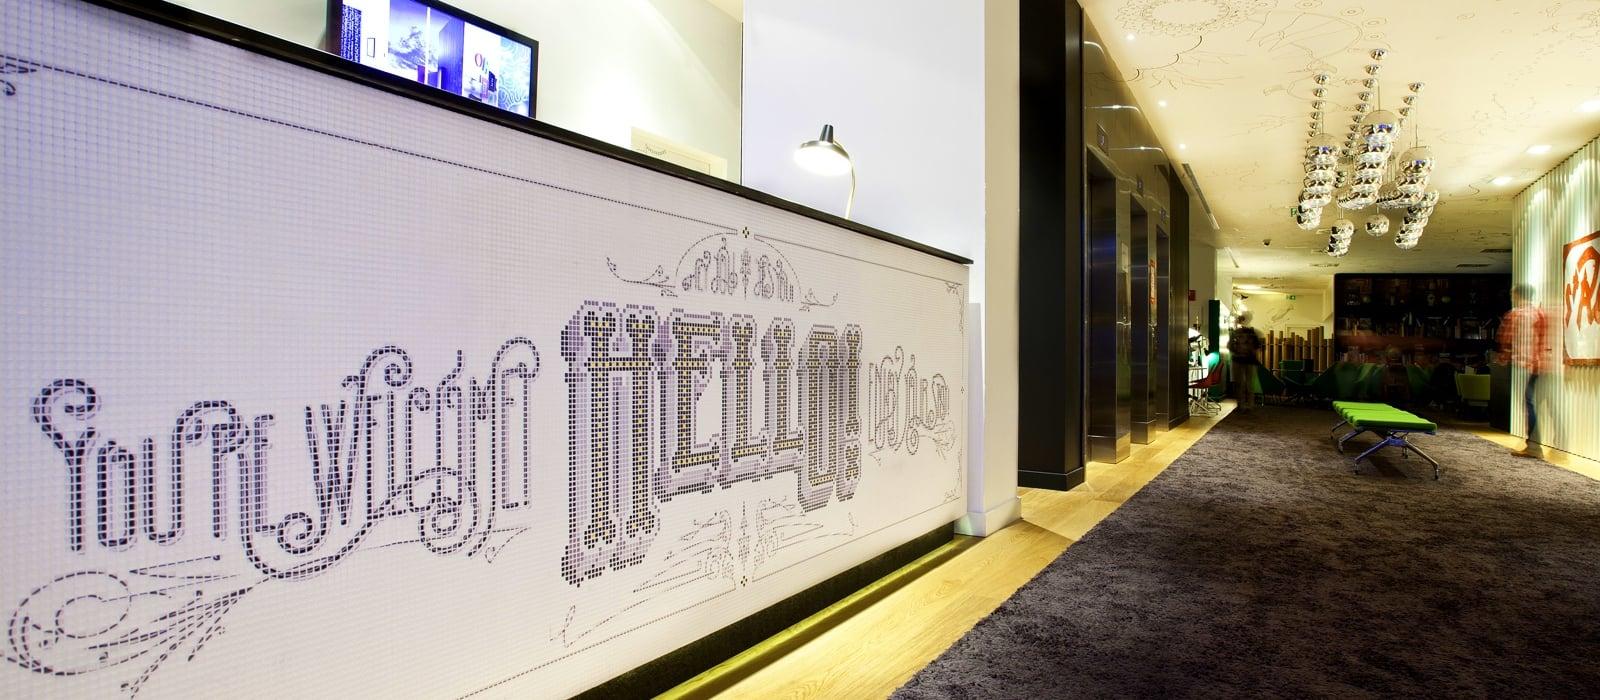 Offerte Bit Hotel Barcelona - Vincci Hoteles - Prenota ora e risparmia! -15%